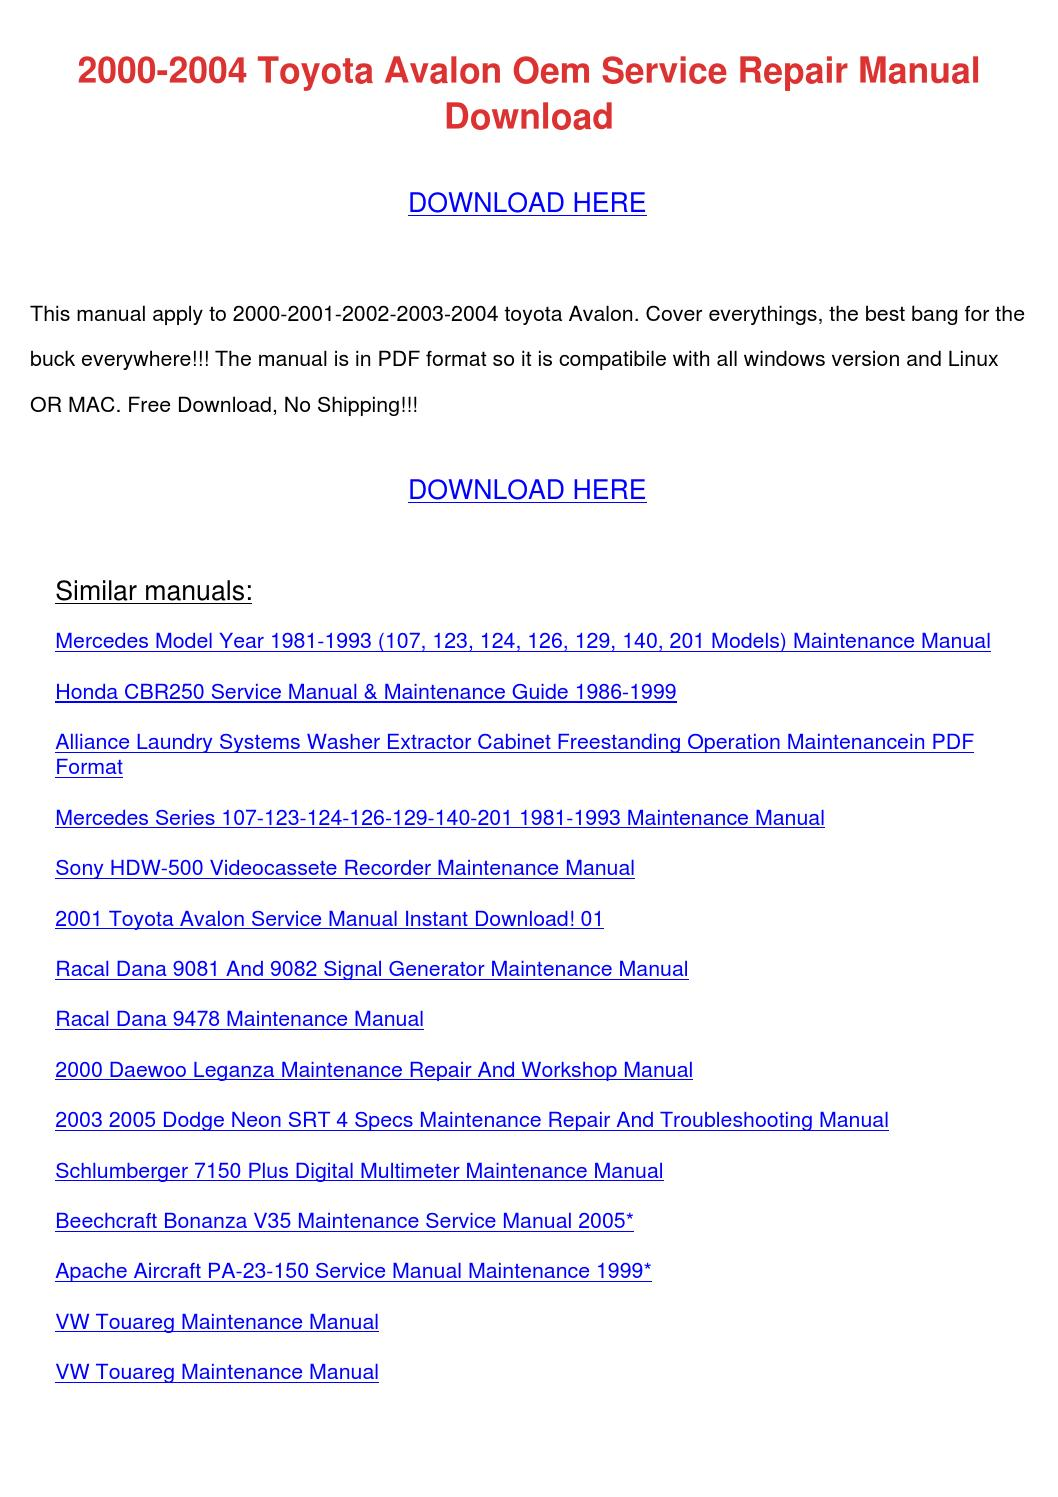 2000 Toyota Avalon Service Manual